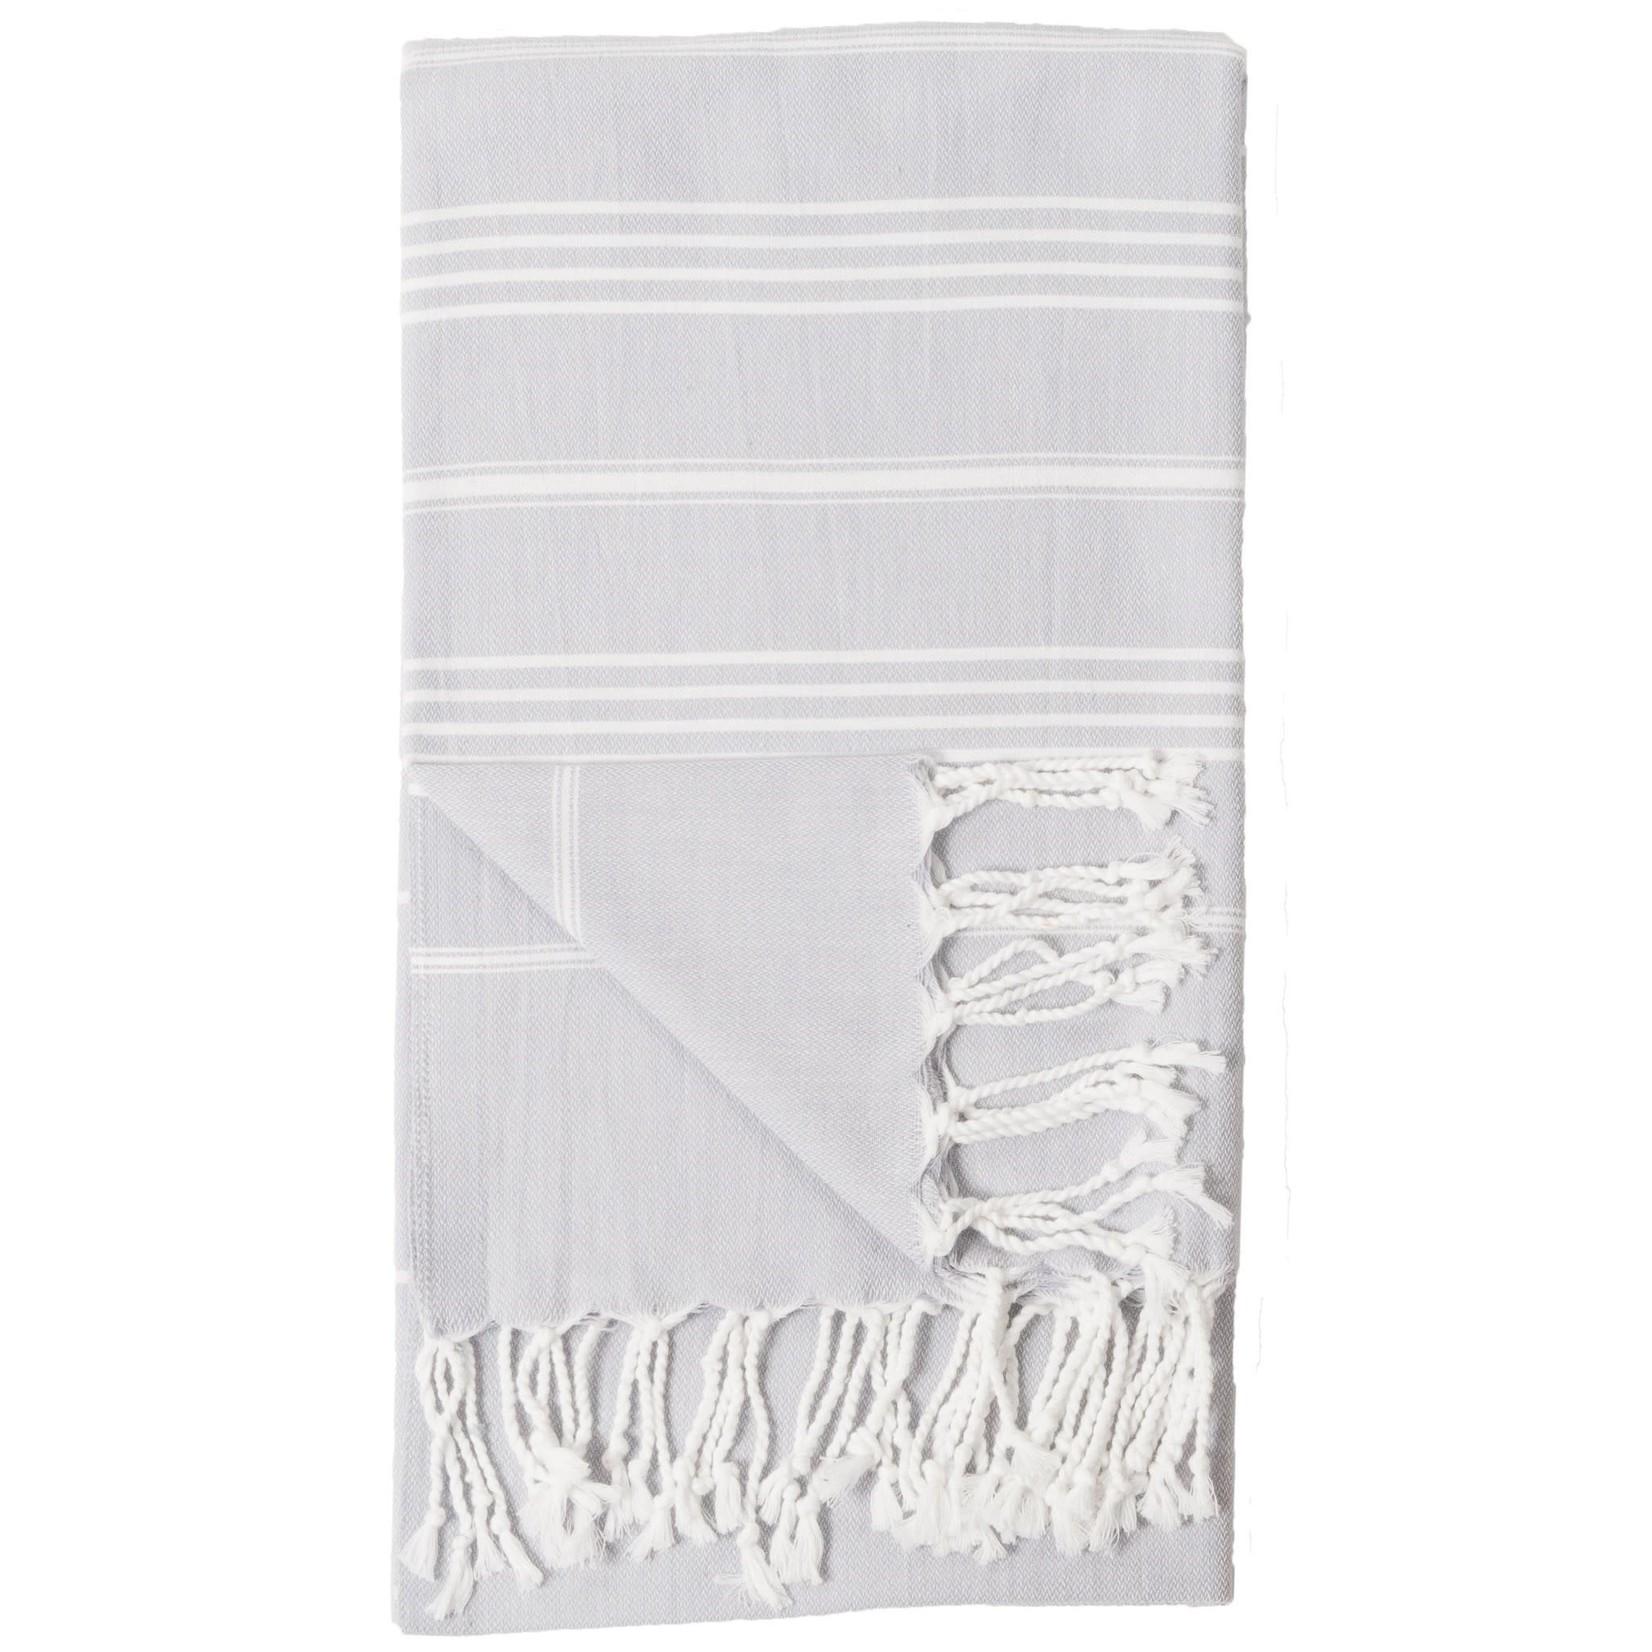 Pokoloko Sultan Towel